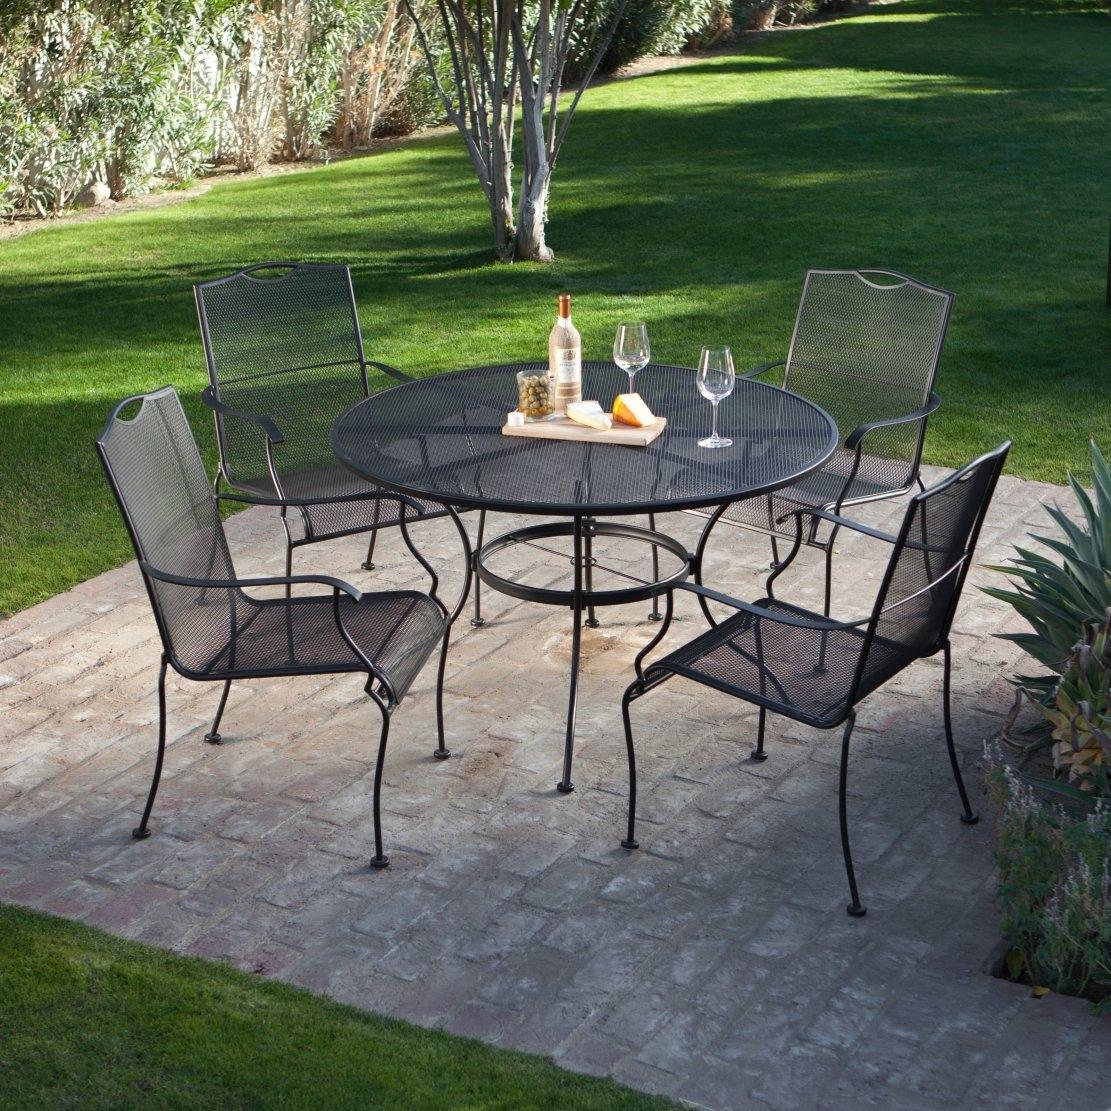 5-piece wrought iron garden furniture set - 4 seats PYSUNSQ